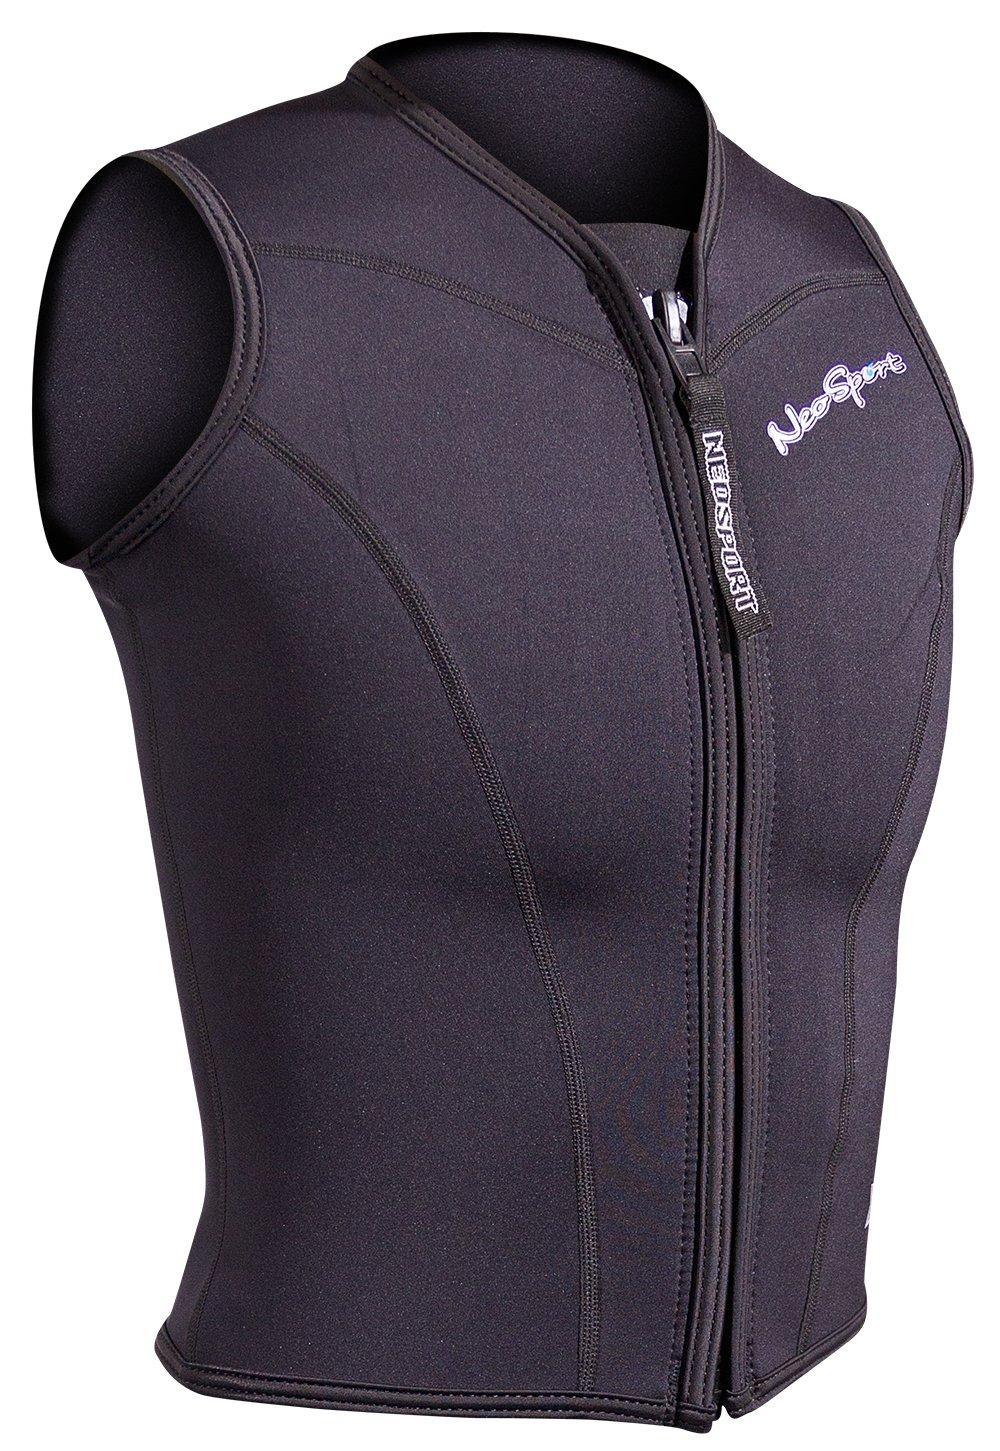 NeoSport Women's 2.5-mm XSPAN Vest (Black, 4) - Water Sports, Diving & Snorkeling by Neo-Sport